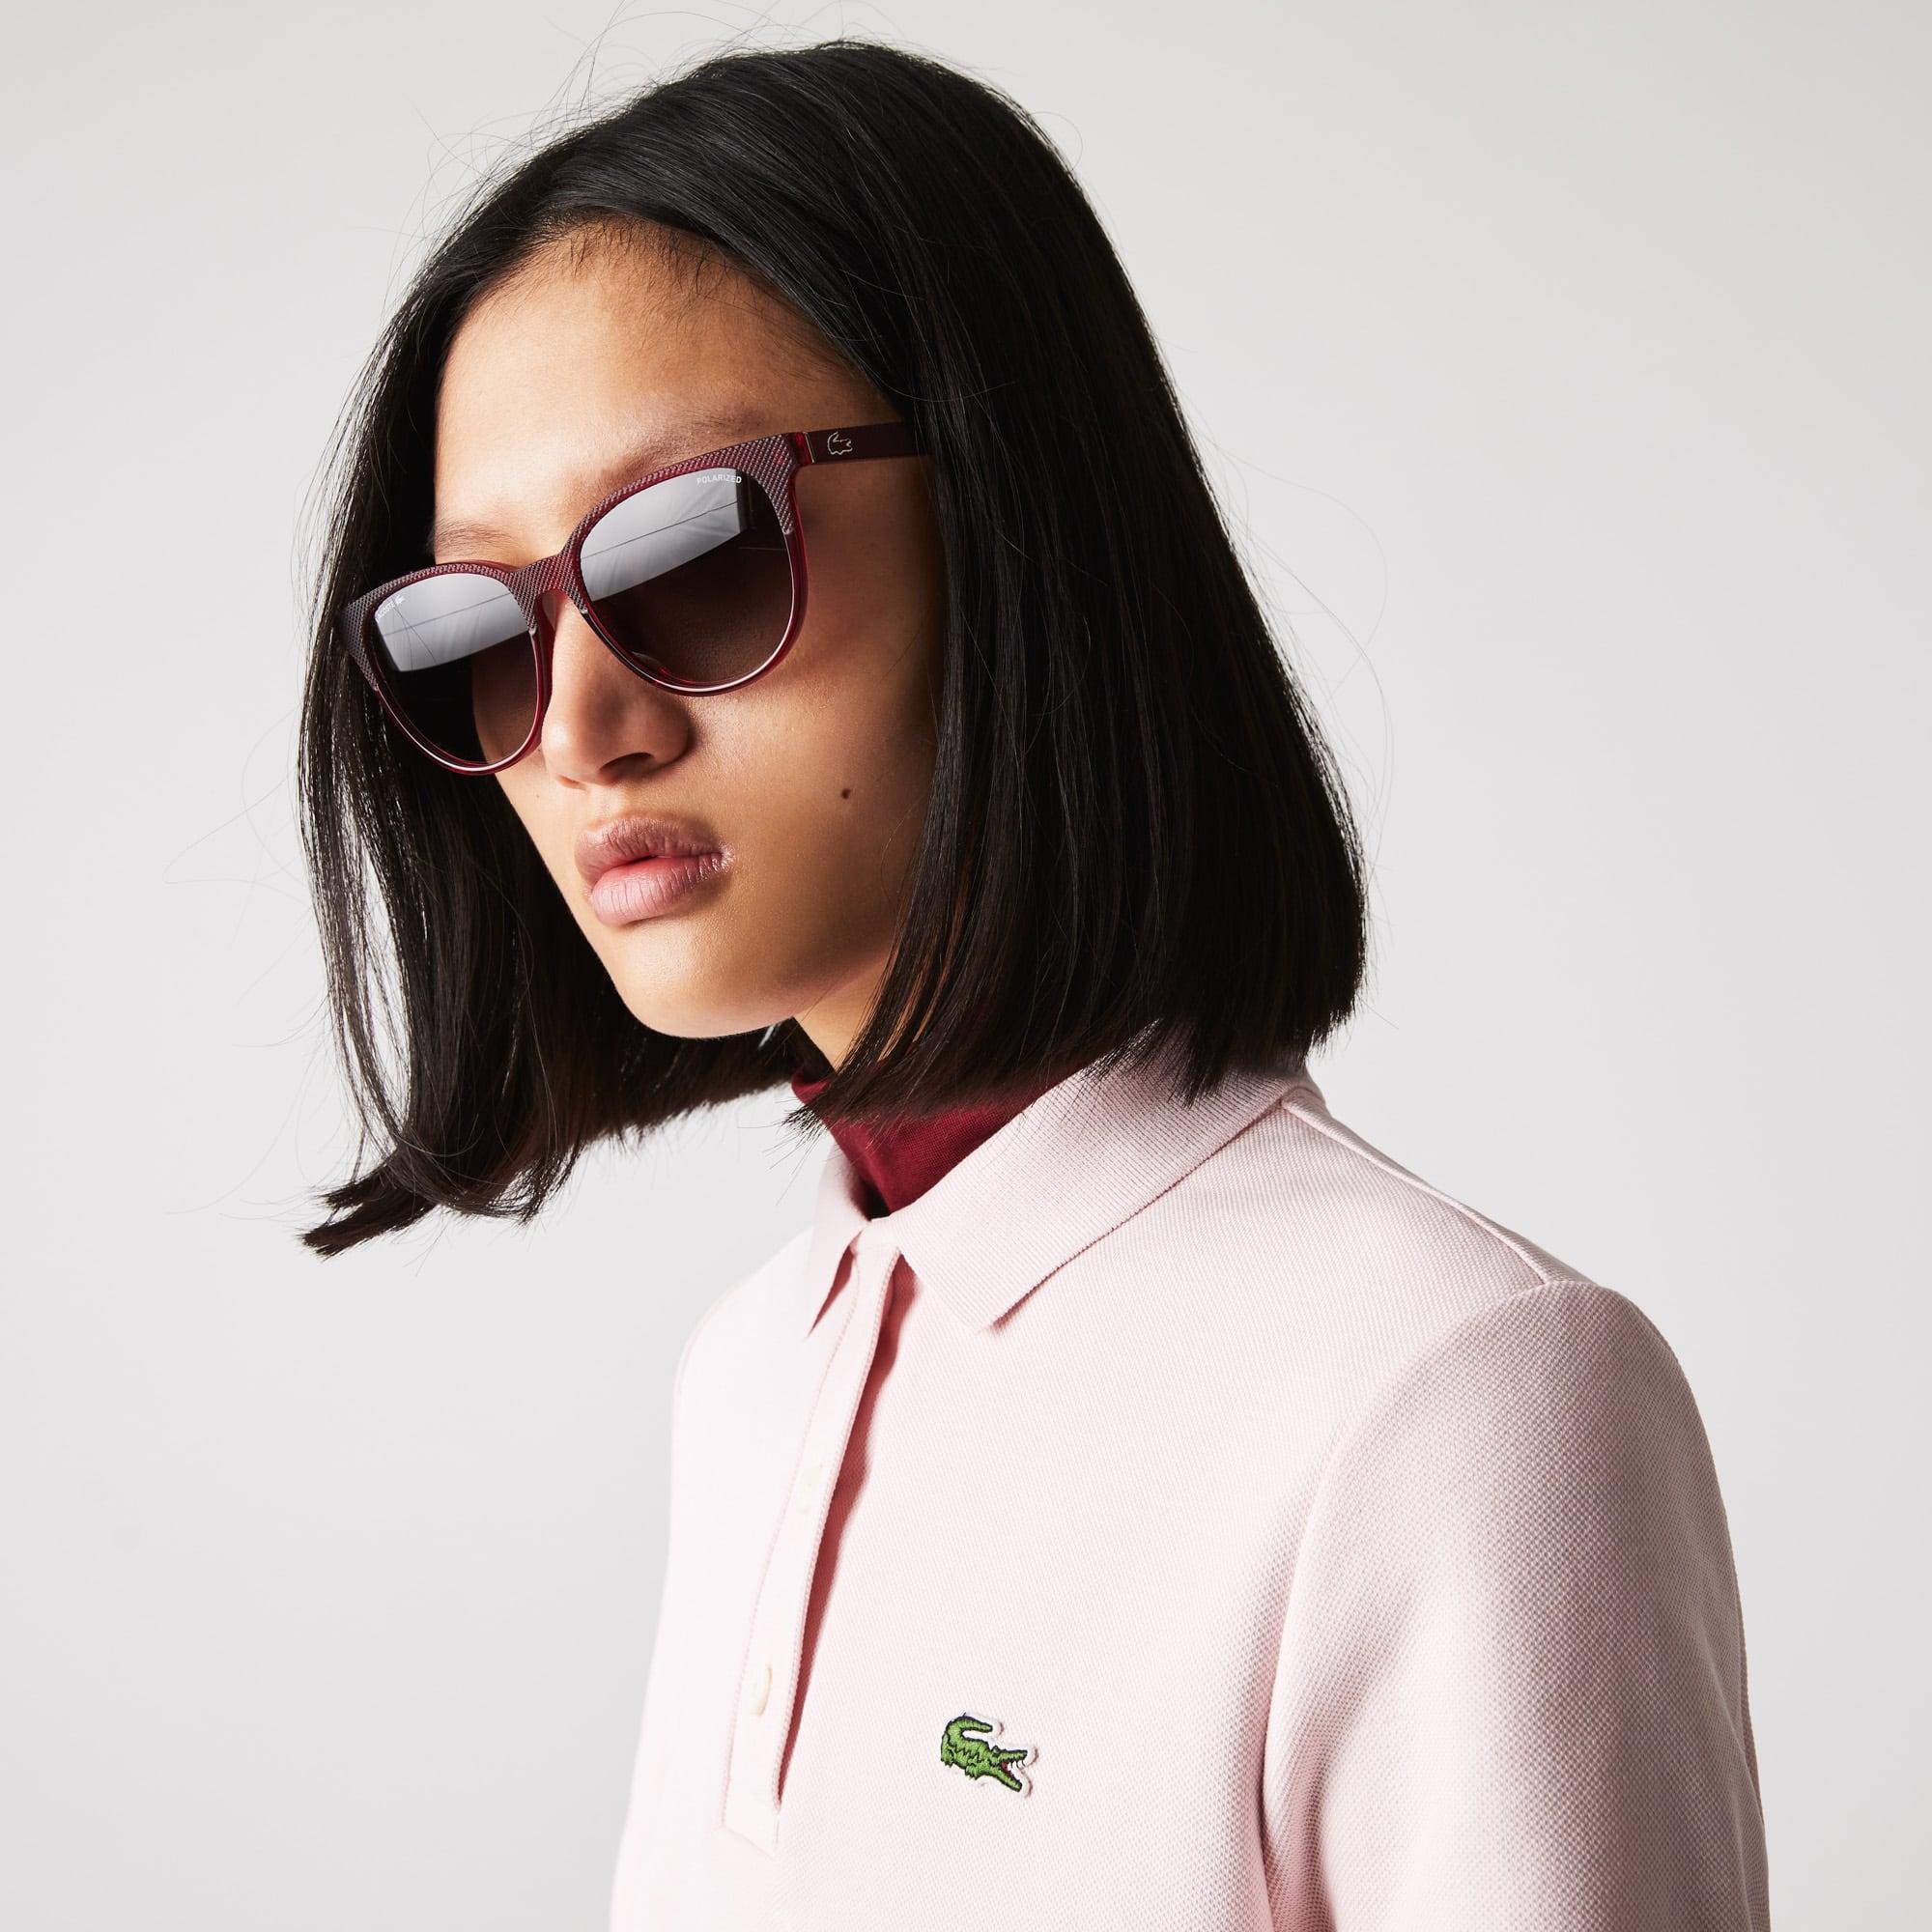 926584efde4b Sunglasses for women